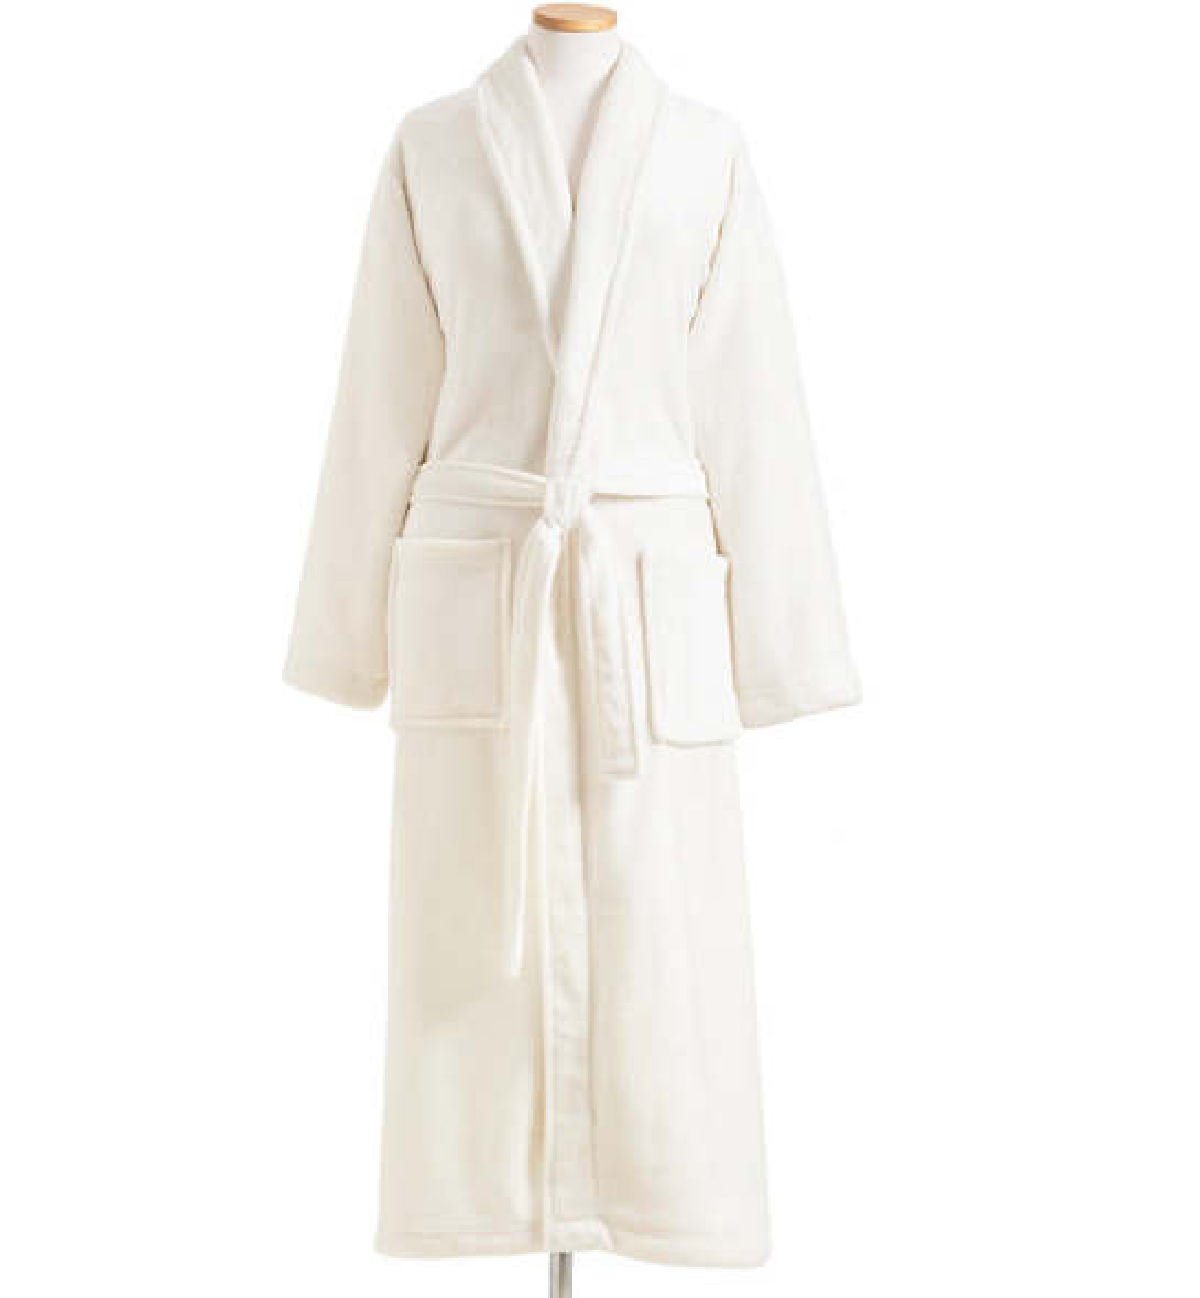 Sheepy Fleece 2.0 Ivory Robe